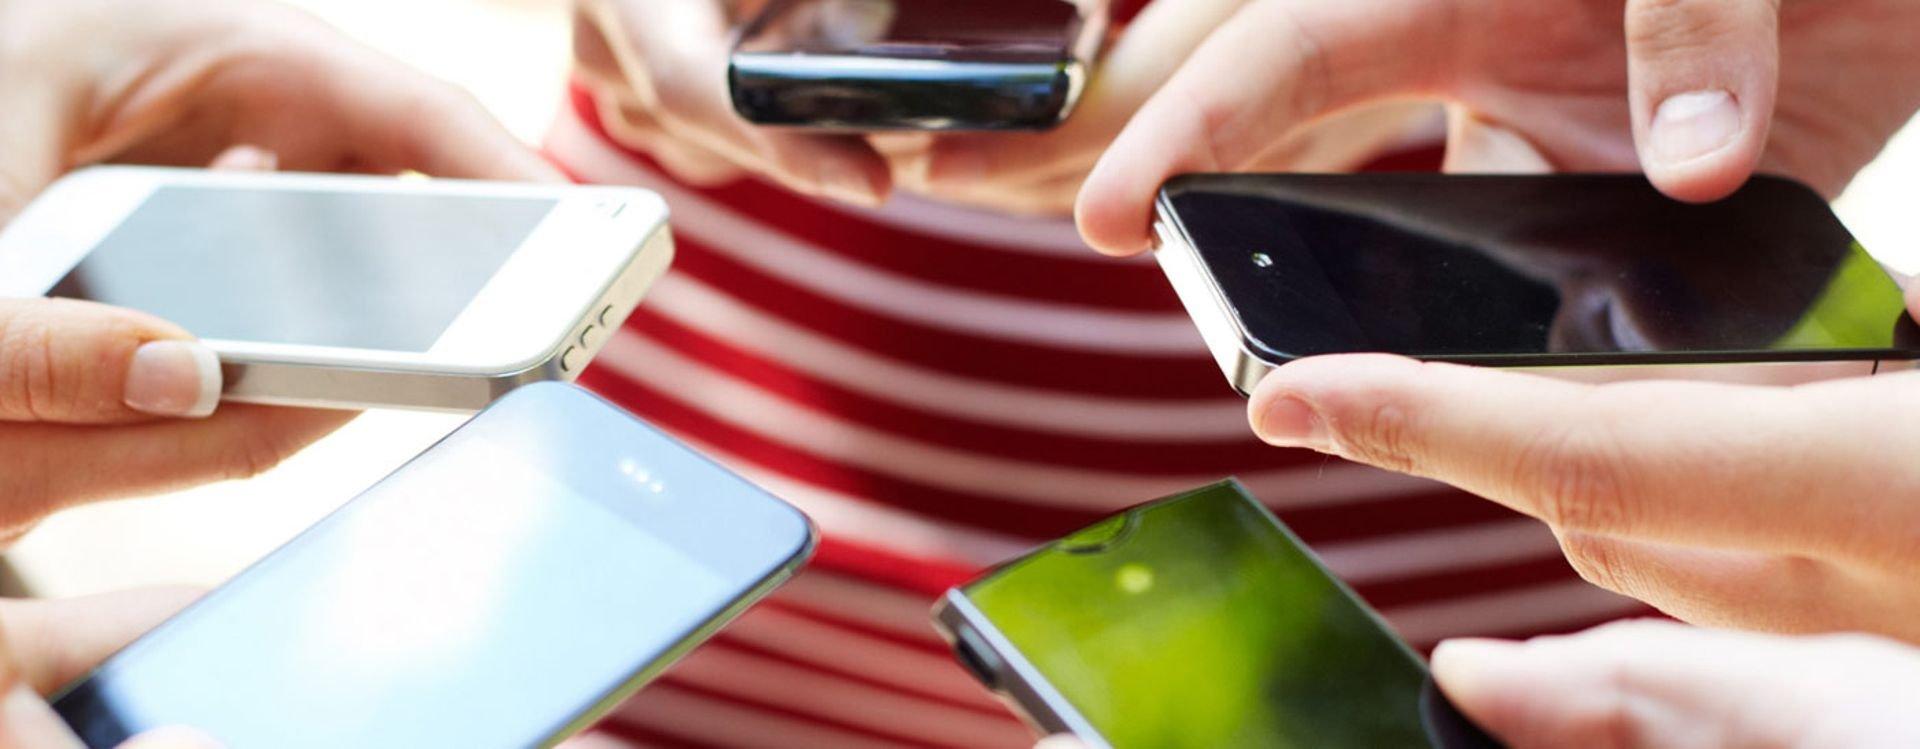 عوامل قد تساعدك في اتخاذ قرار شراء هاتف ذكي جديد